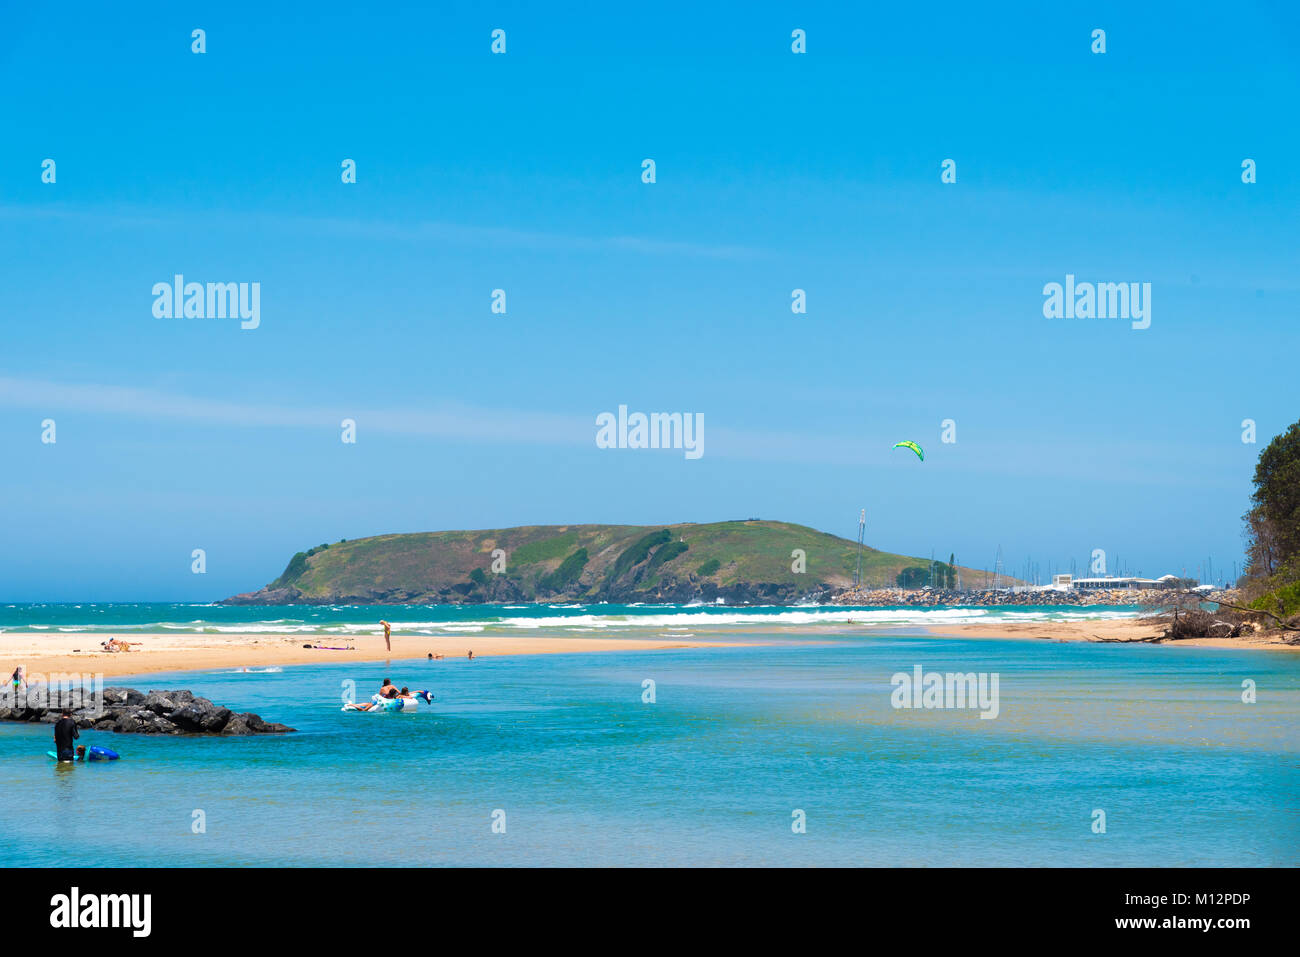 Sandy beach to coffs harbour bus